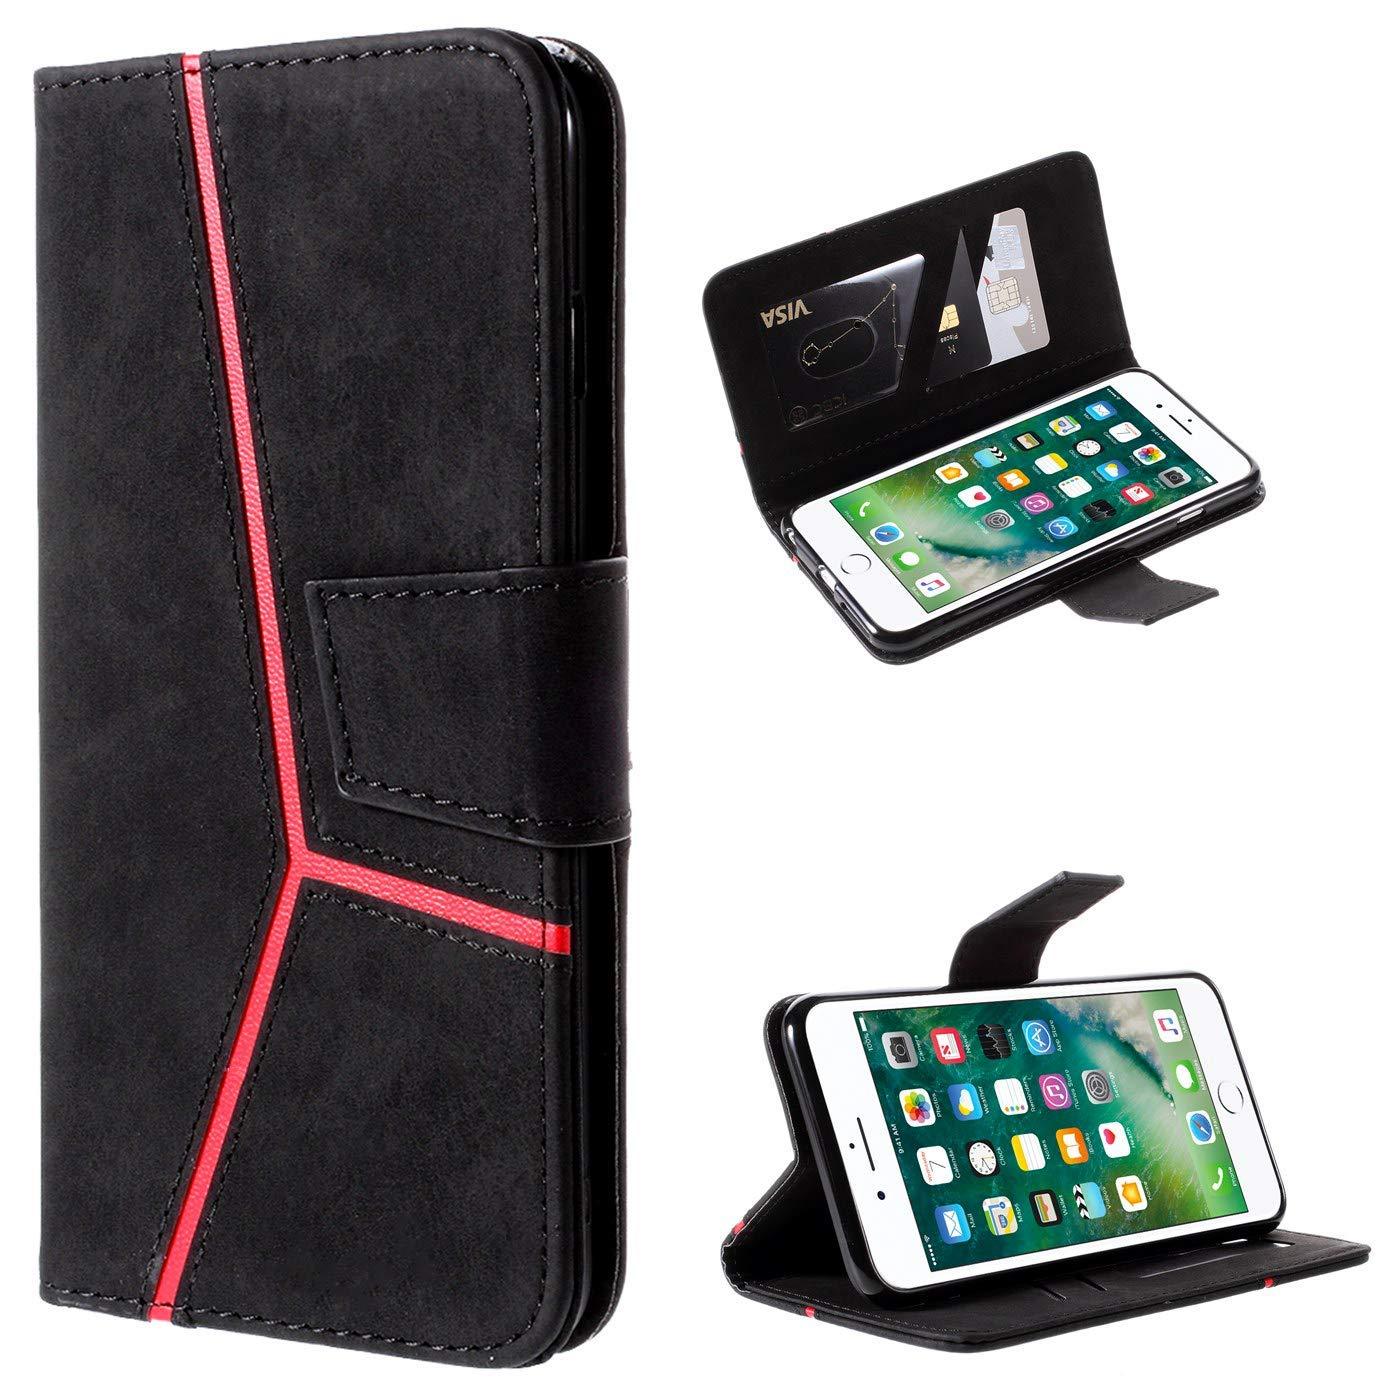 iPhone 6S,Schwarz Hancda H/ülle f/ür iPhone 6 Handytasche H/ülle Case PU Leder Klapph/ülle mit Kartenfach Flip Handyh/ülle Cover Magnet Lederh/ülle Sto/ßfest Case Schutzh/ülle f/ür iPhone 6 iPhone 6S